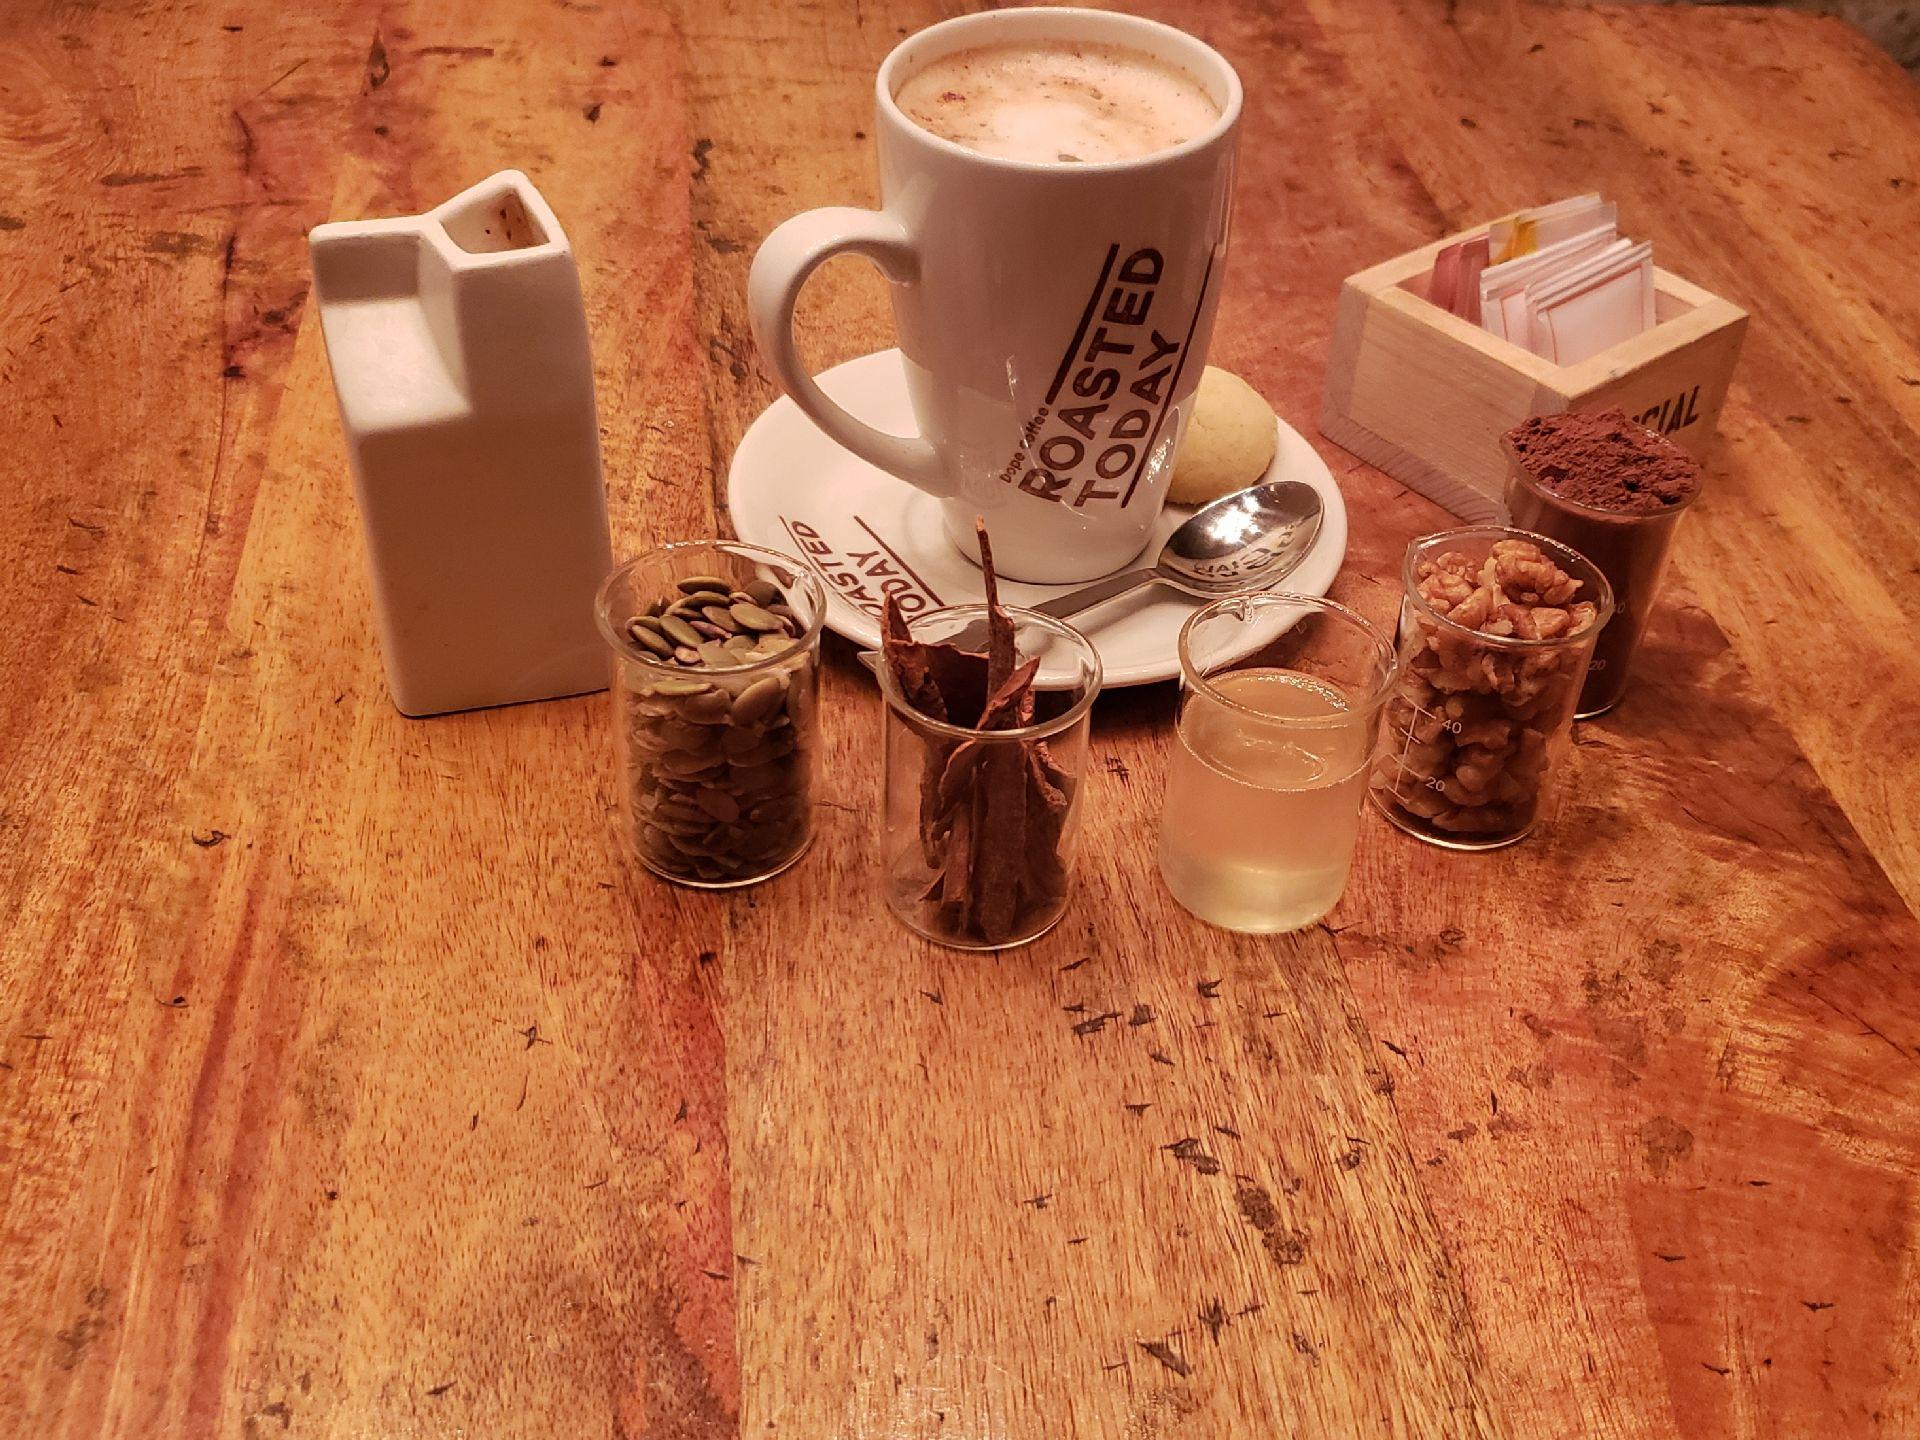 Bulletproof coffee, the latest food trend | Deccan Herald